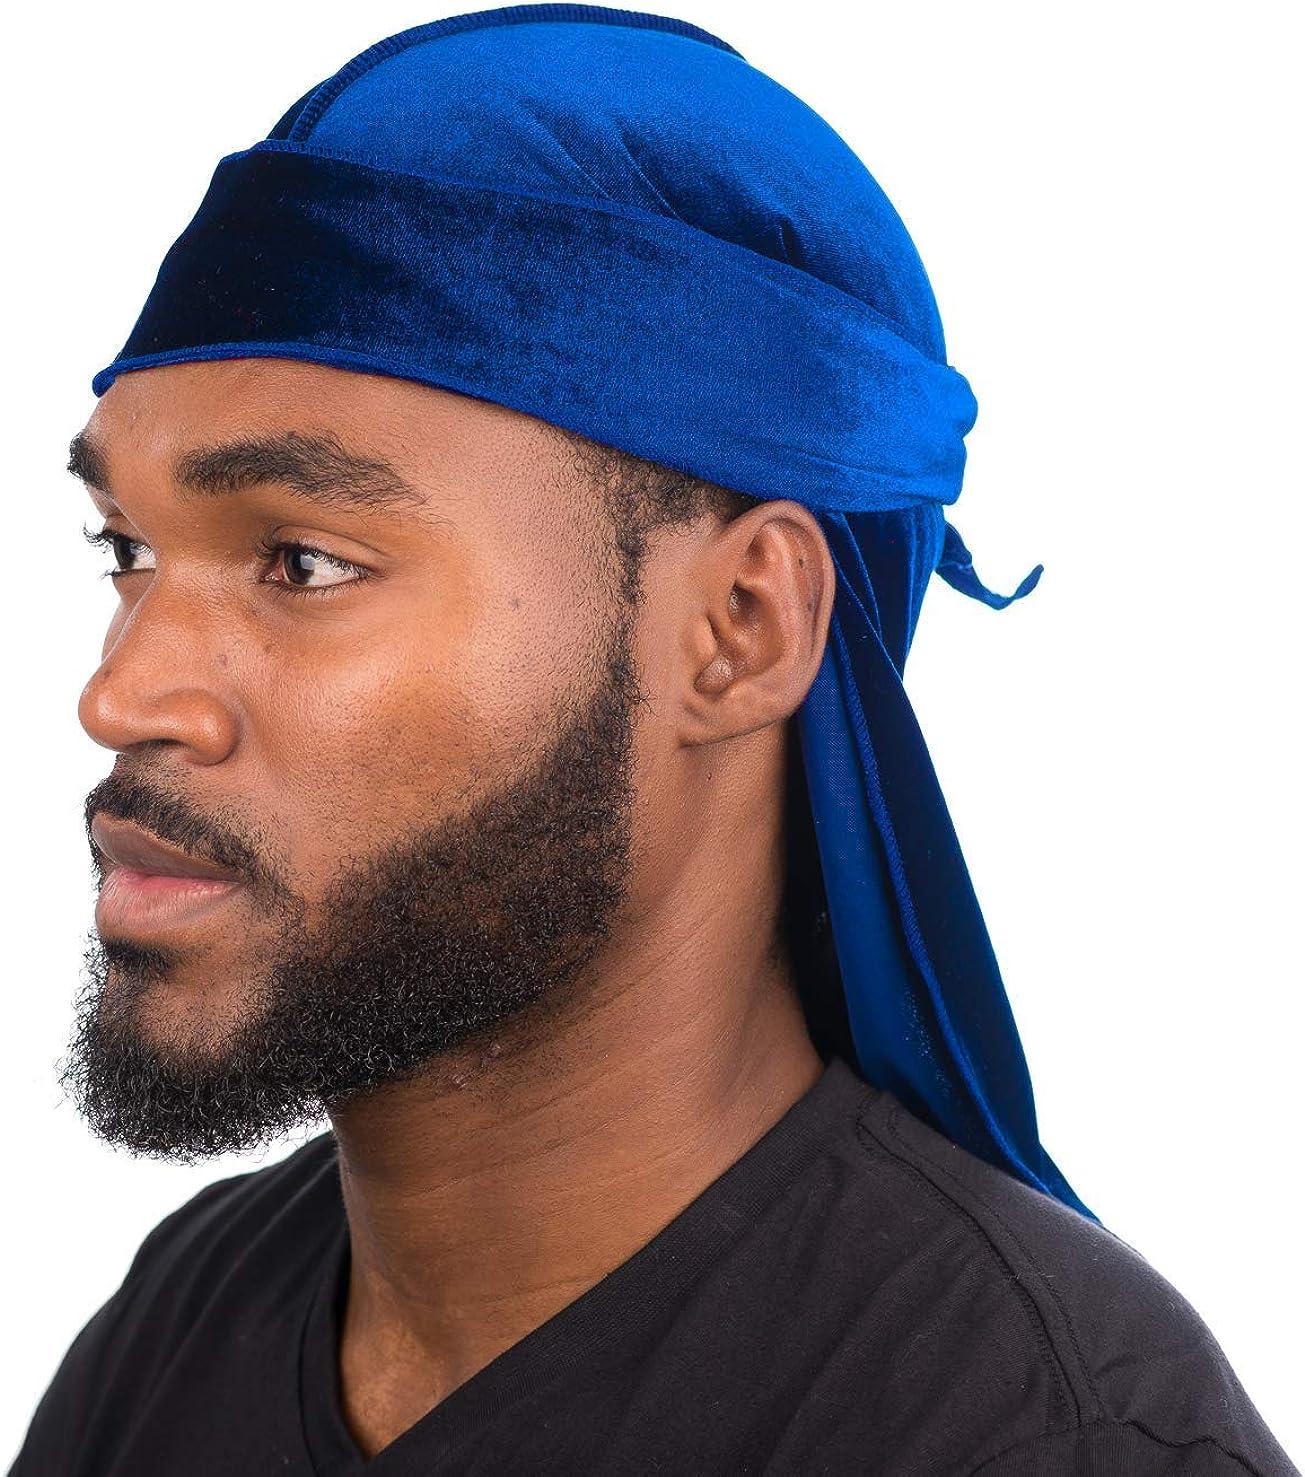 Black Money - Velvet Color Durag Premium Bandana for Men 360 Waves (All top Selling Colors) at ...